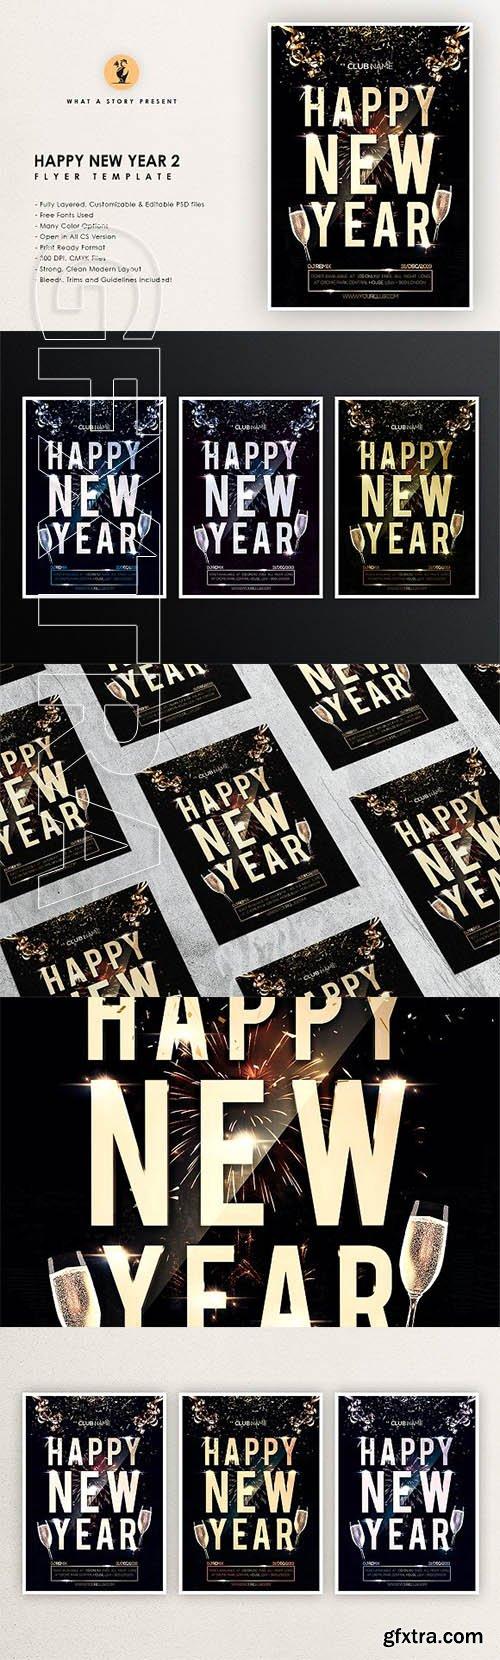 CreativeMarket - New Year Party 2 2473486